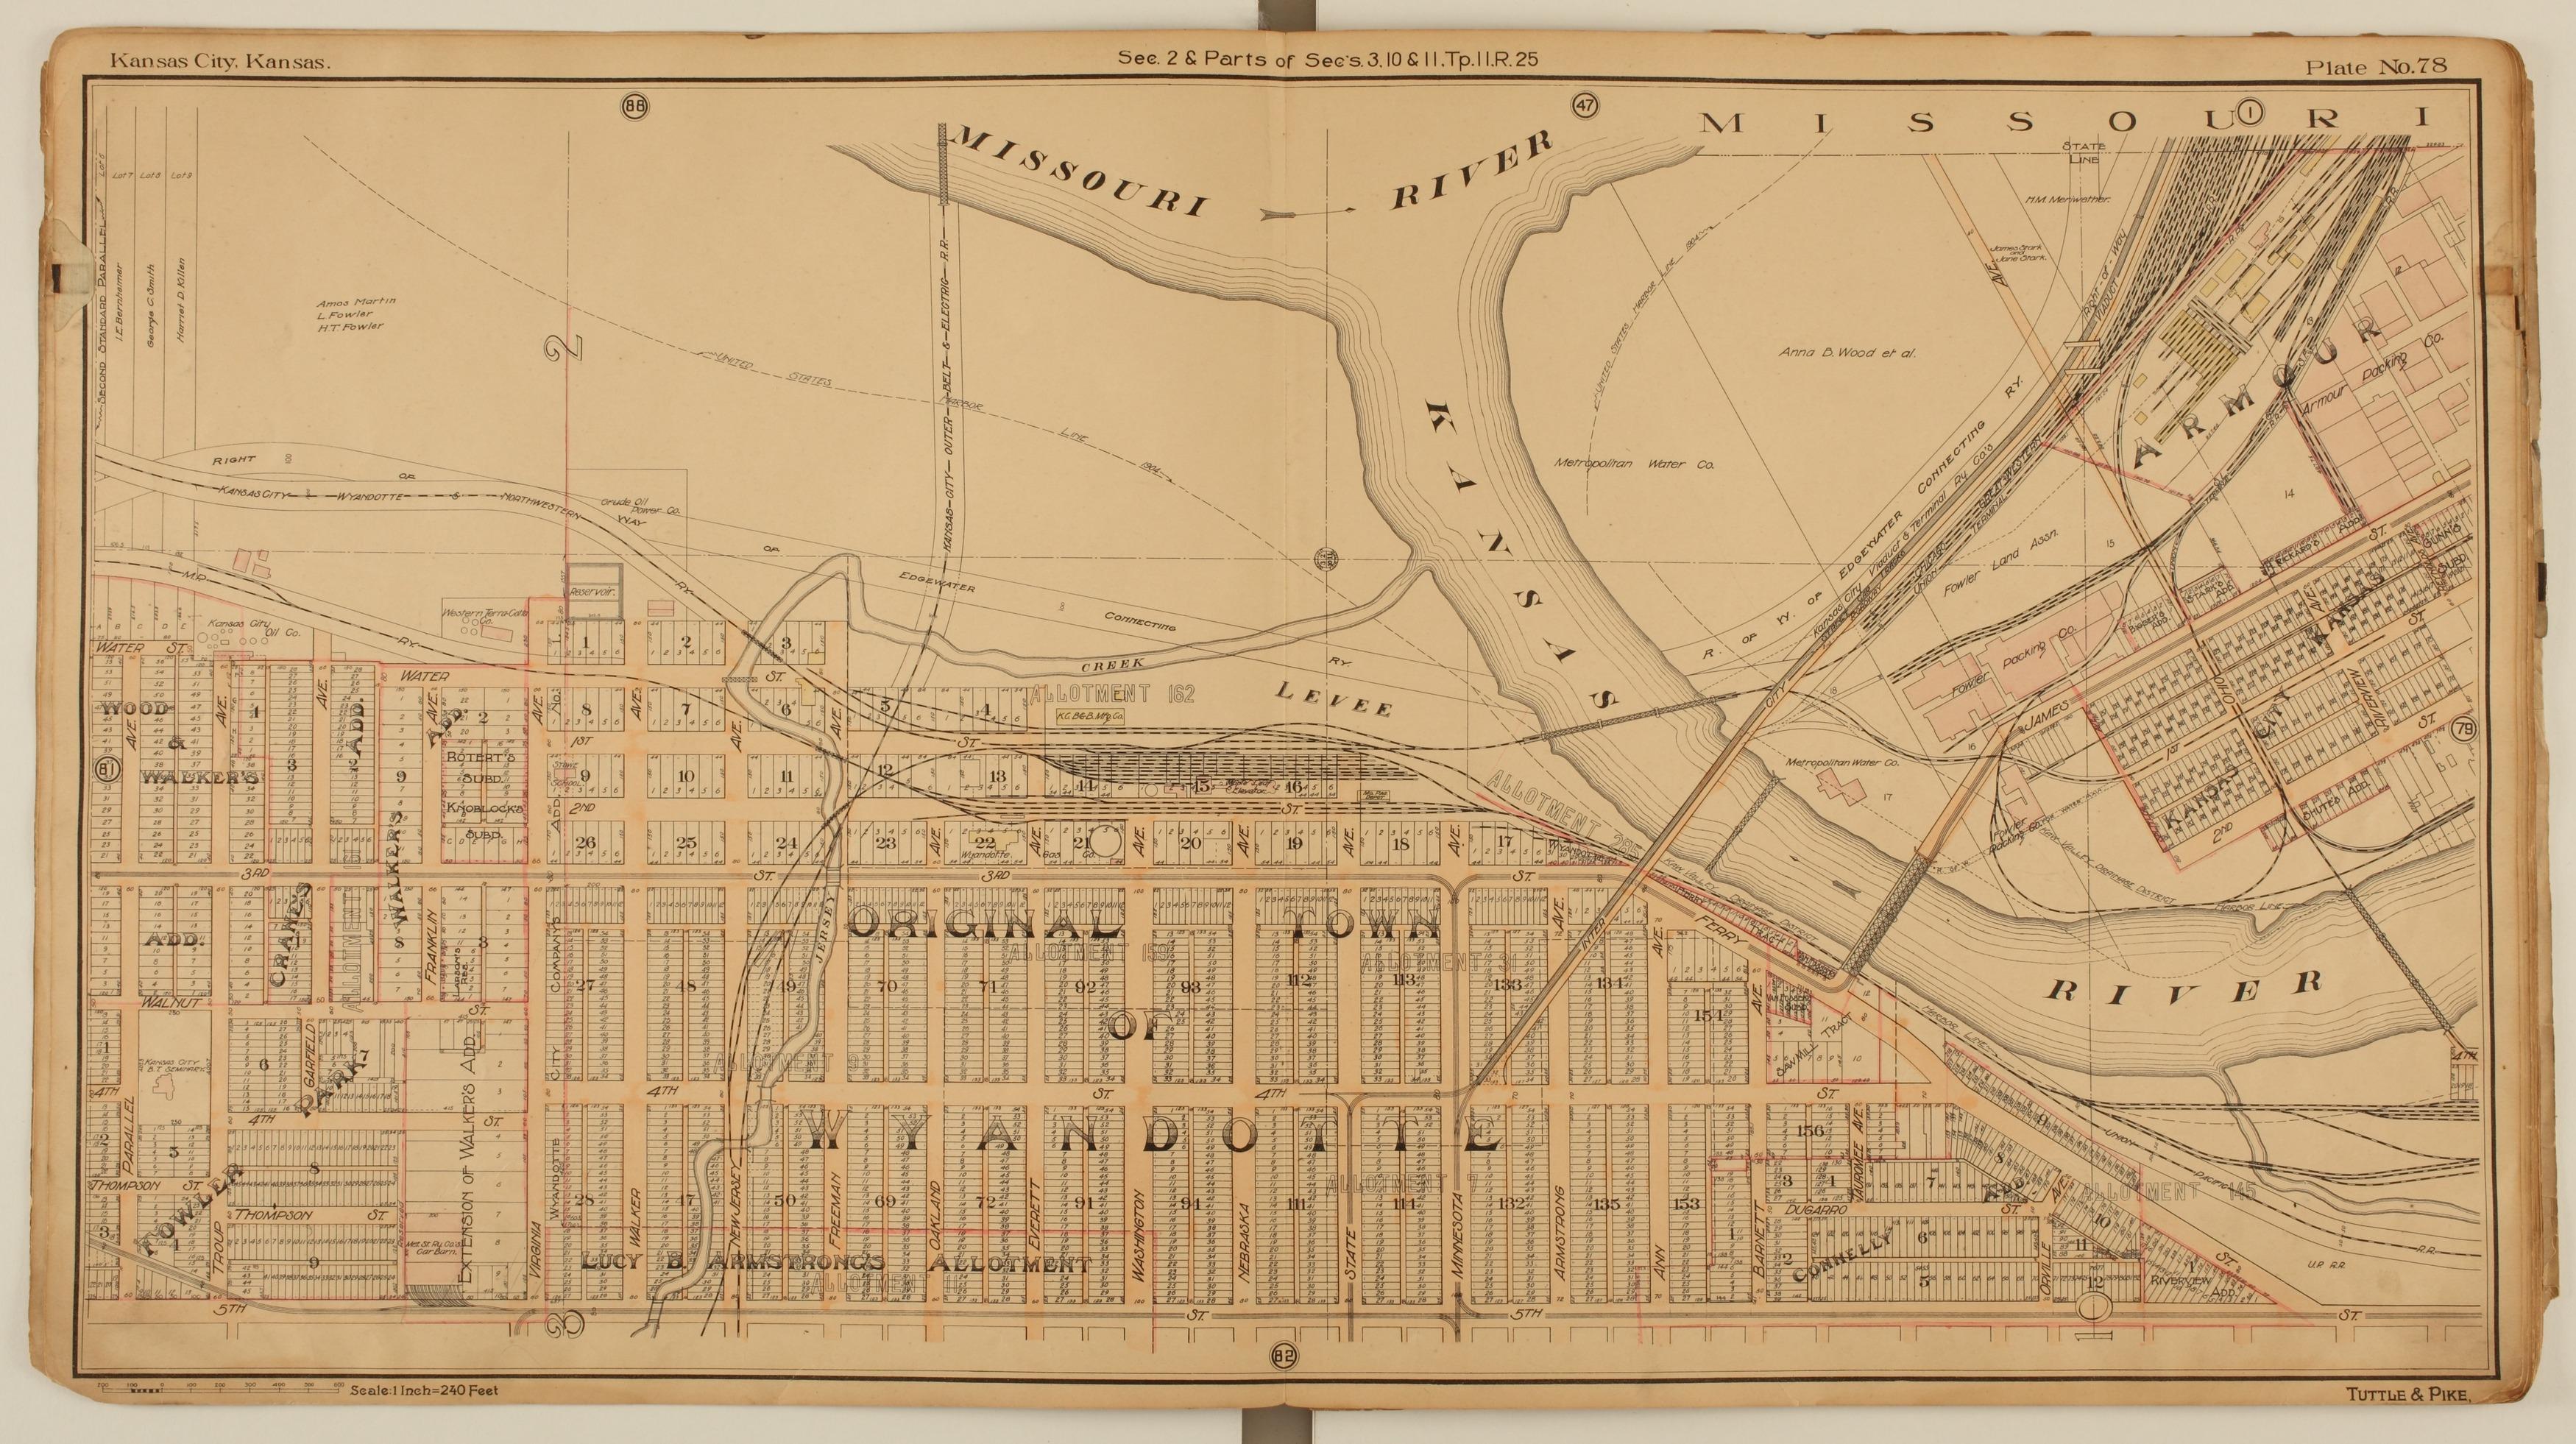 Tuttle and Pike's atlas of Kansas City, Kansas - 4